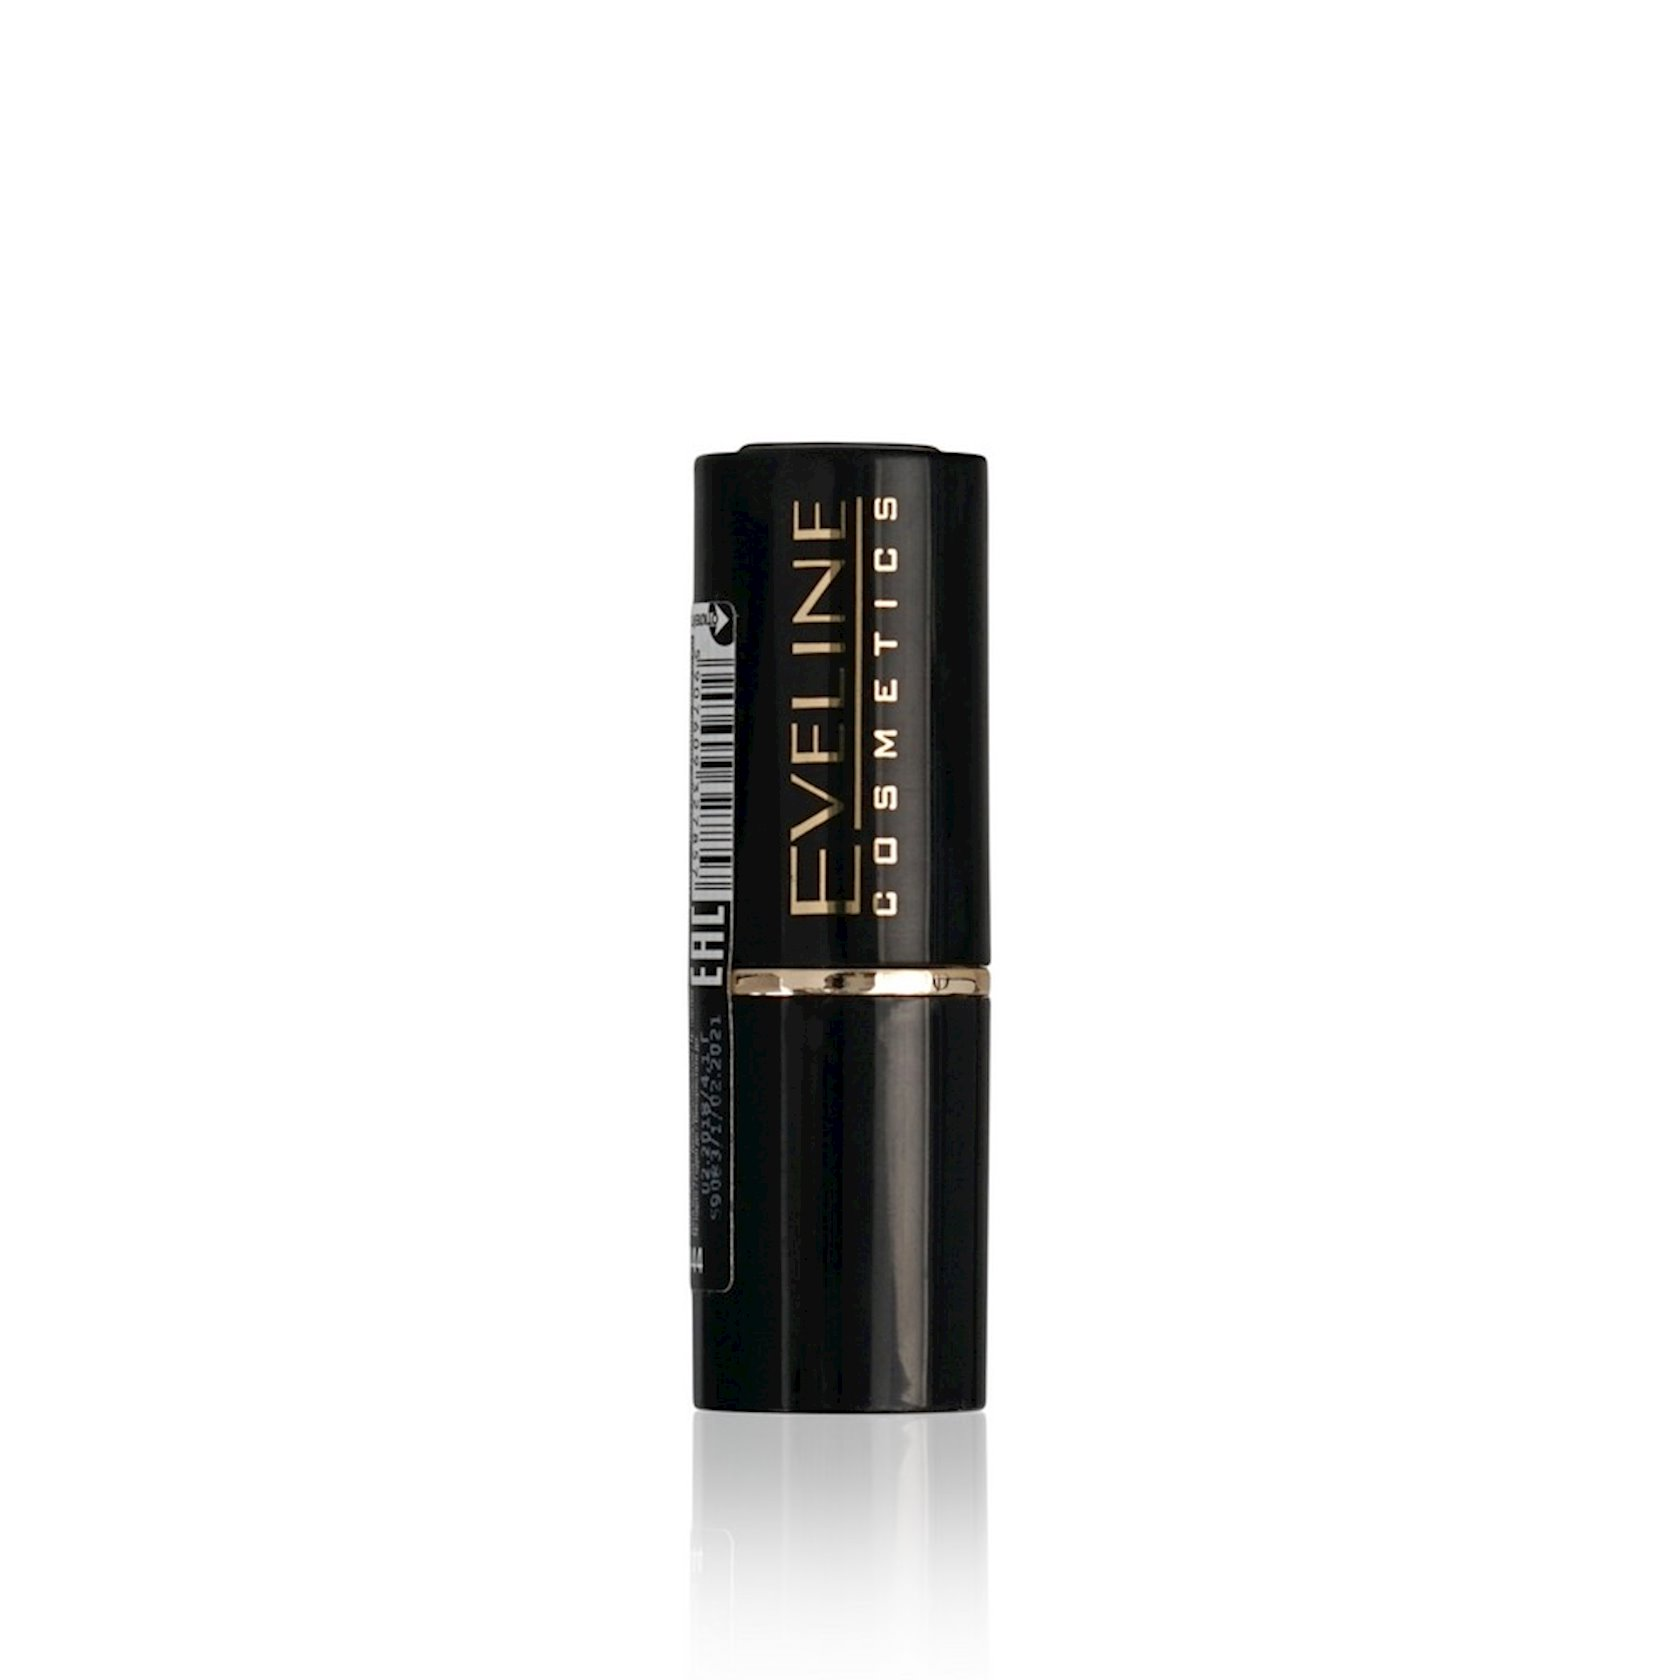 Ultra Nəmləndirici Pomada Eveline Cosmetics Aqua Platinum Lipstick çalar 444